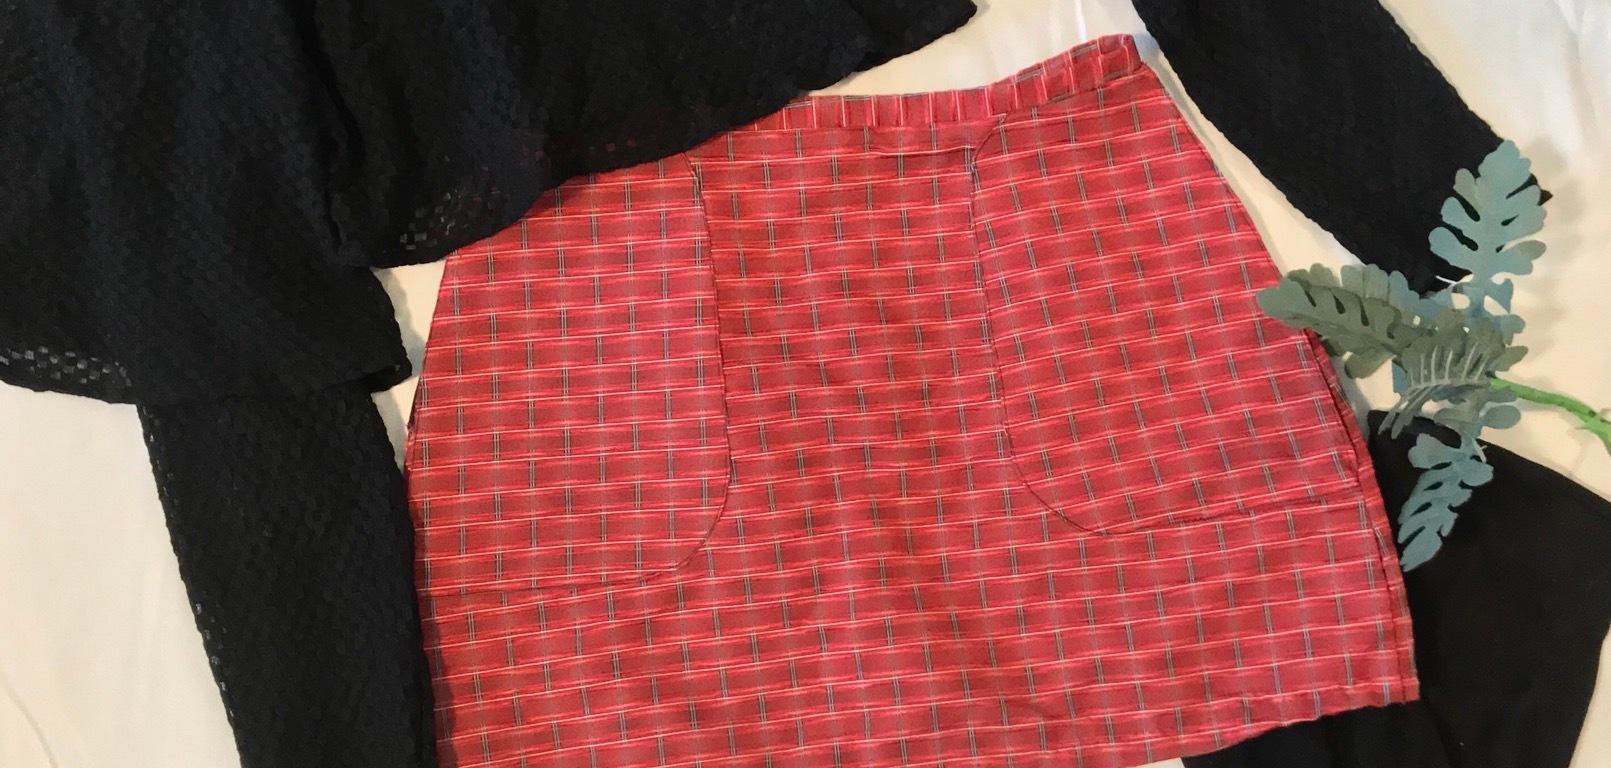 Sheer handmade top handmade plaid skirt